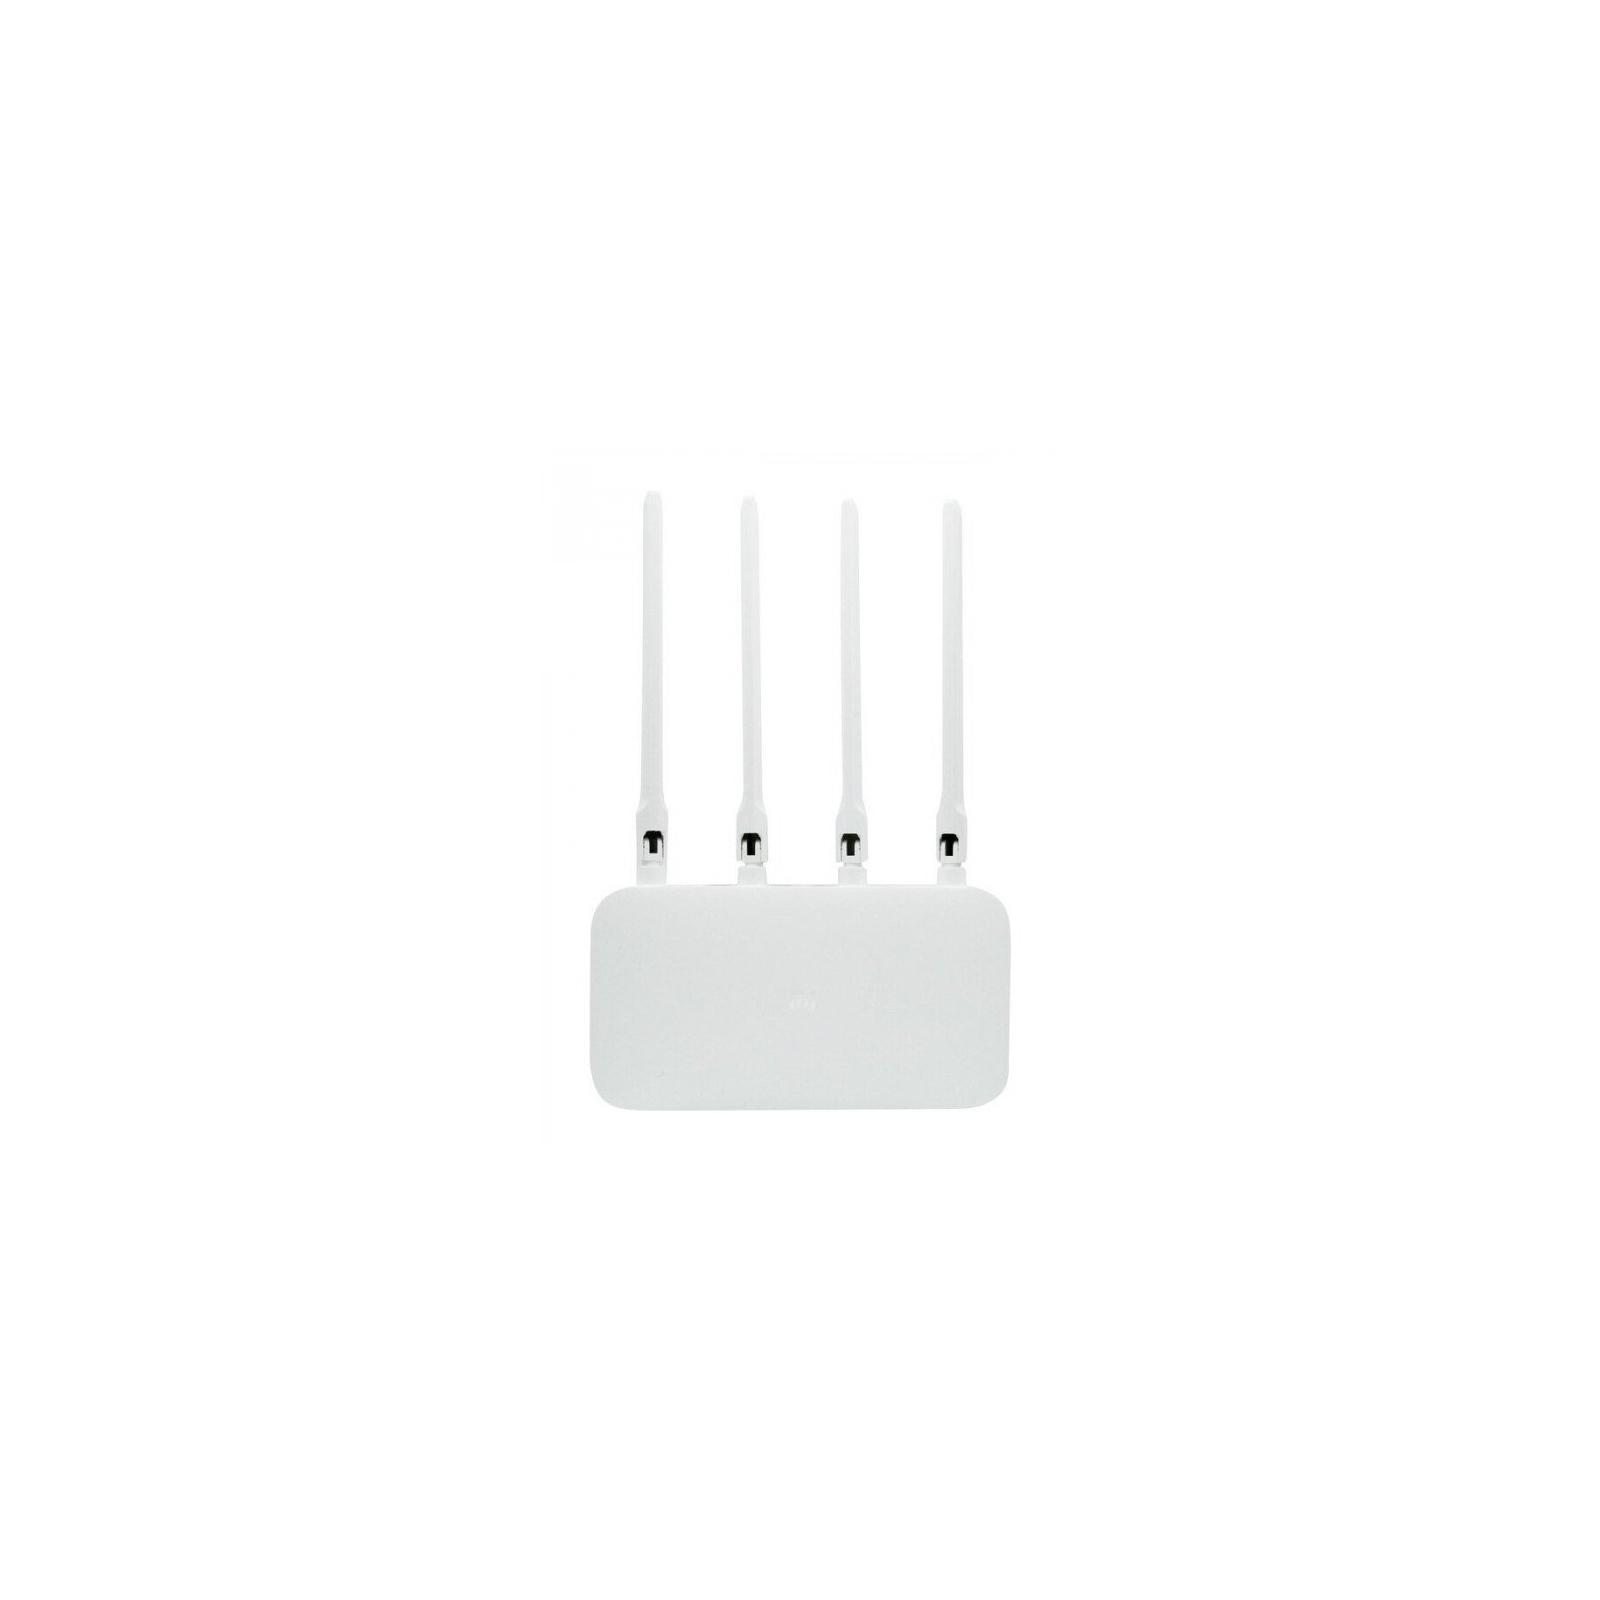 Маршрутизатор Xiaomi Mi Router 4A Giga Global зображення 2